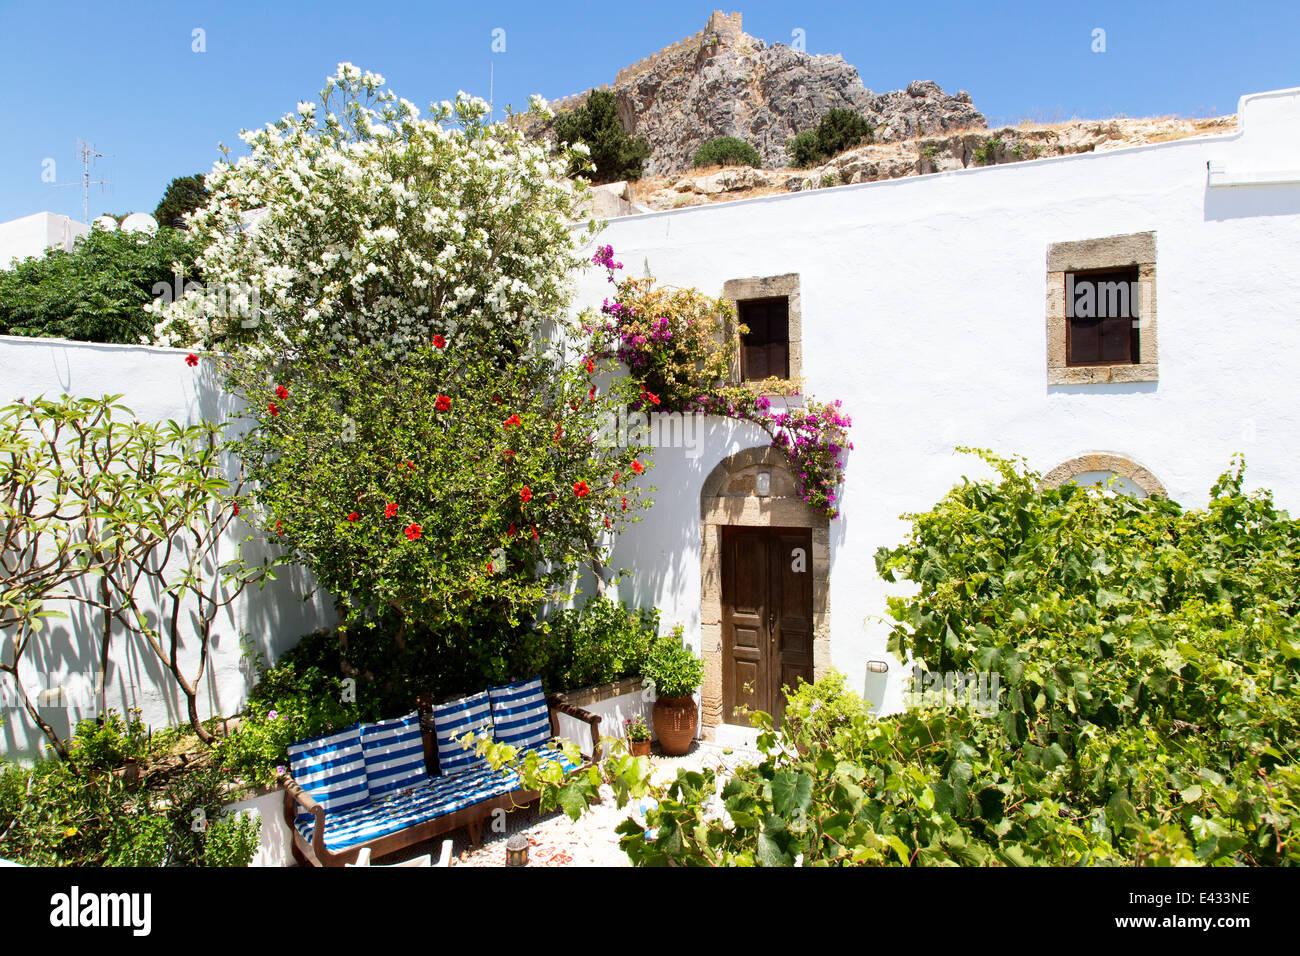 Garden Plants Traditional Villa Lindos Greece - Stock Image